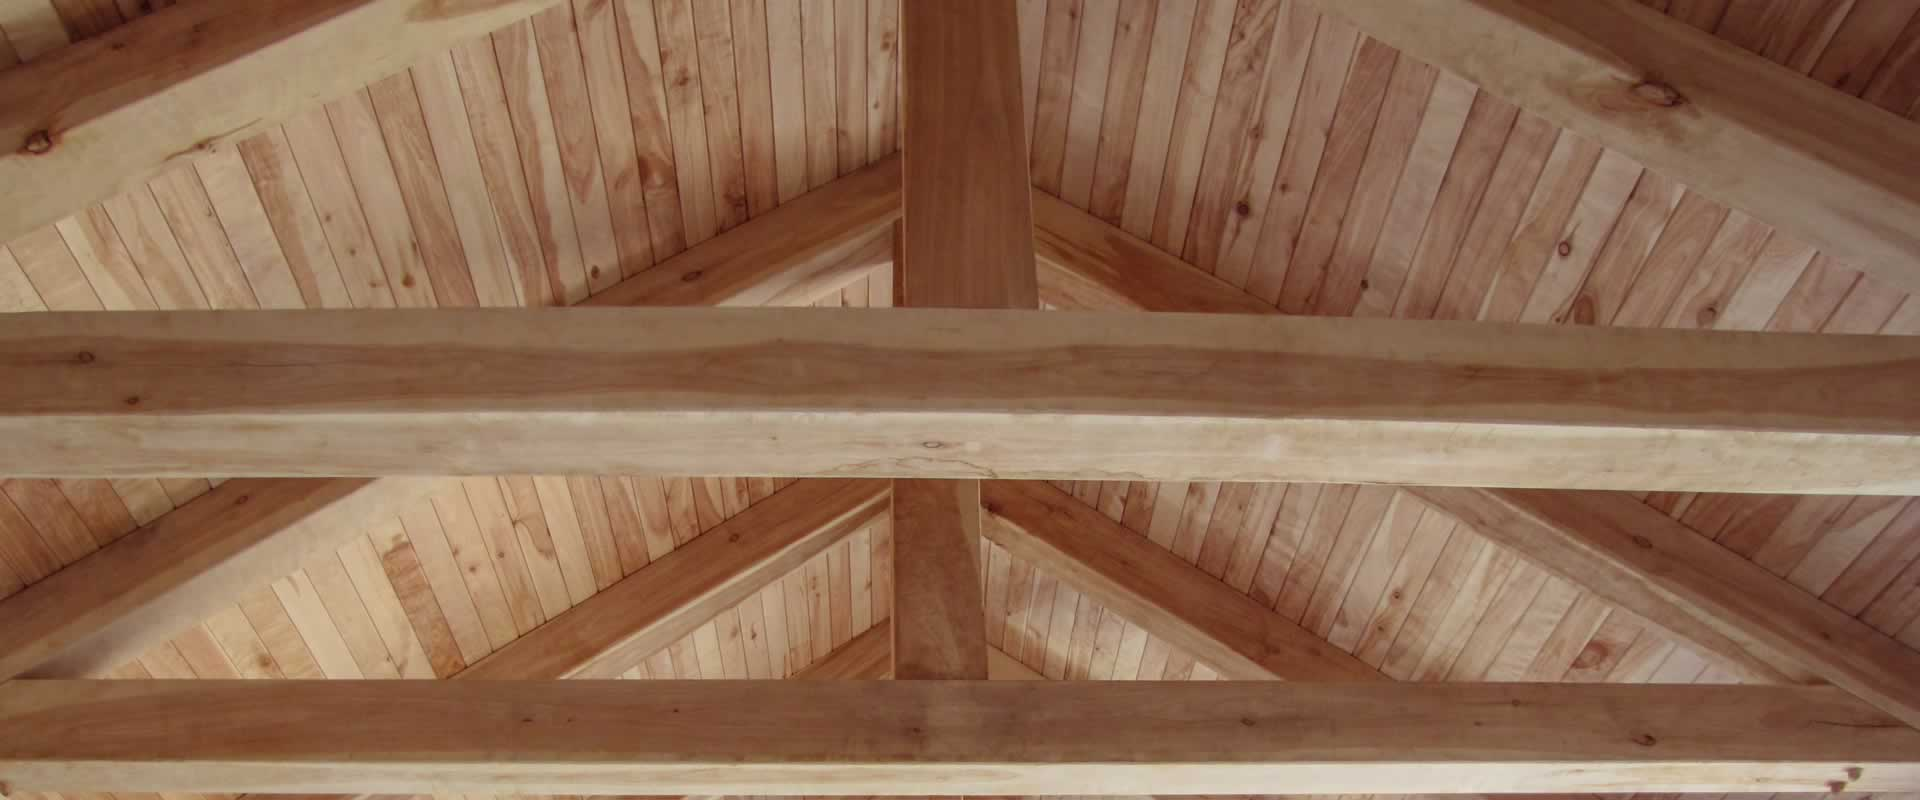 Poplar Beams Poles Wood Flooring Chestnut Grove Sawmills